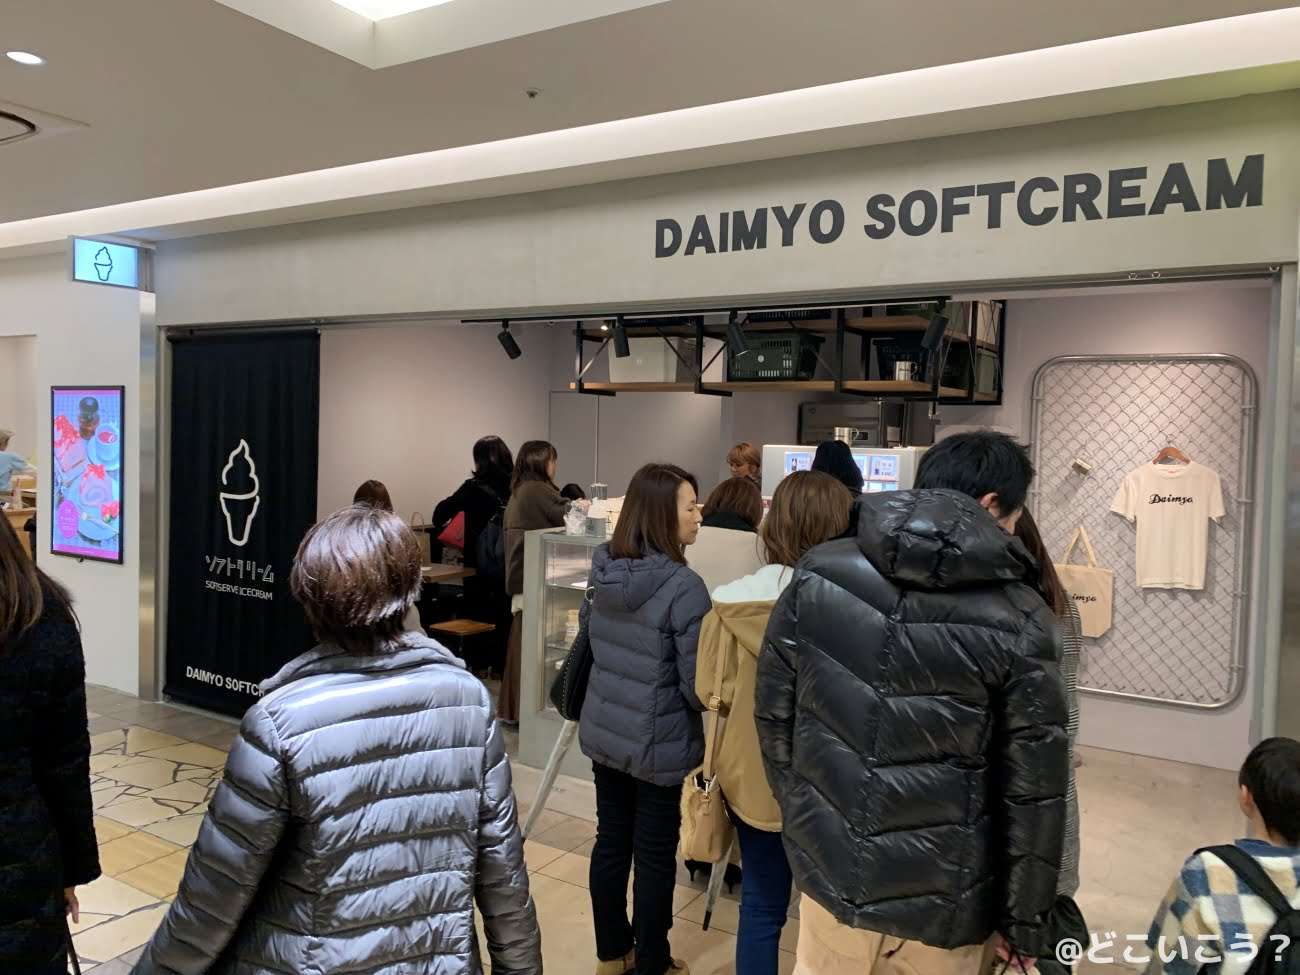 Daimyo Soft Cream